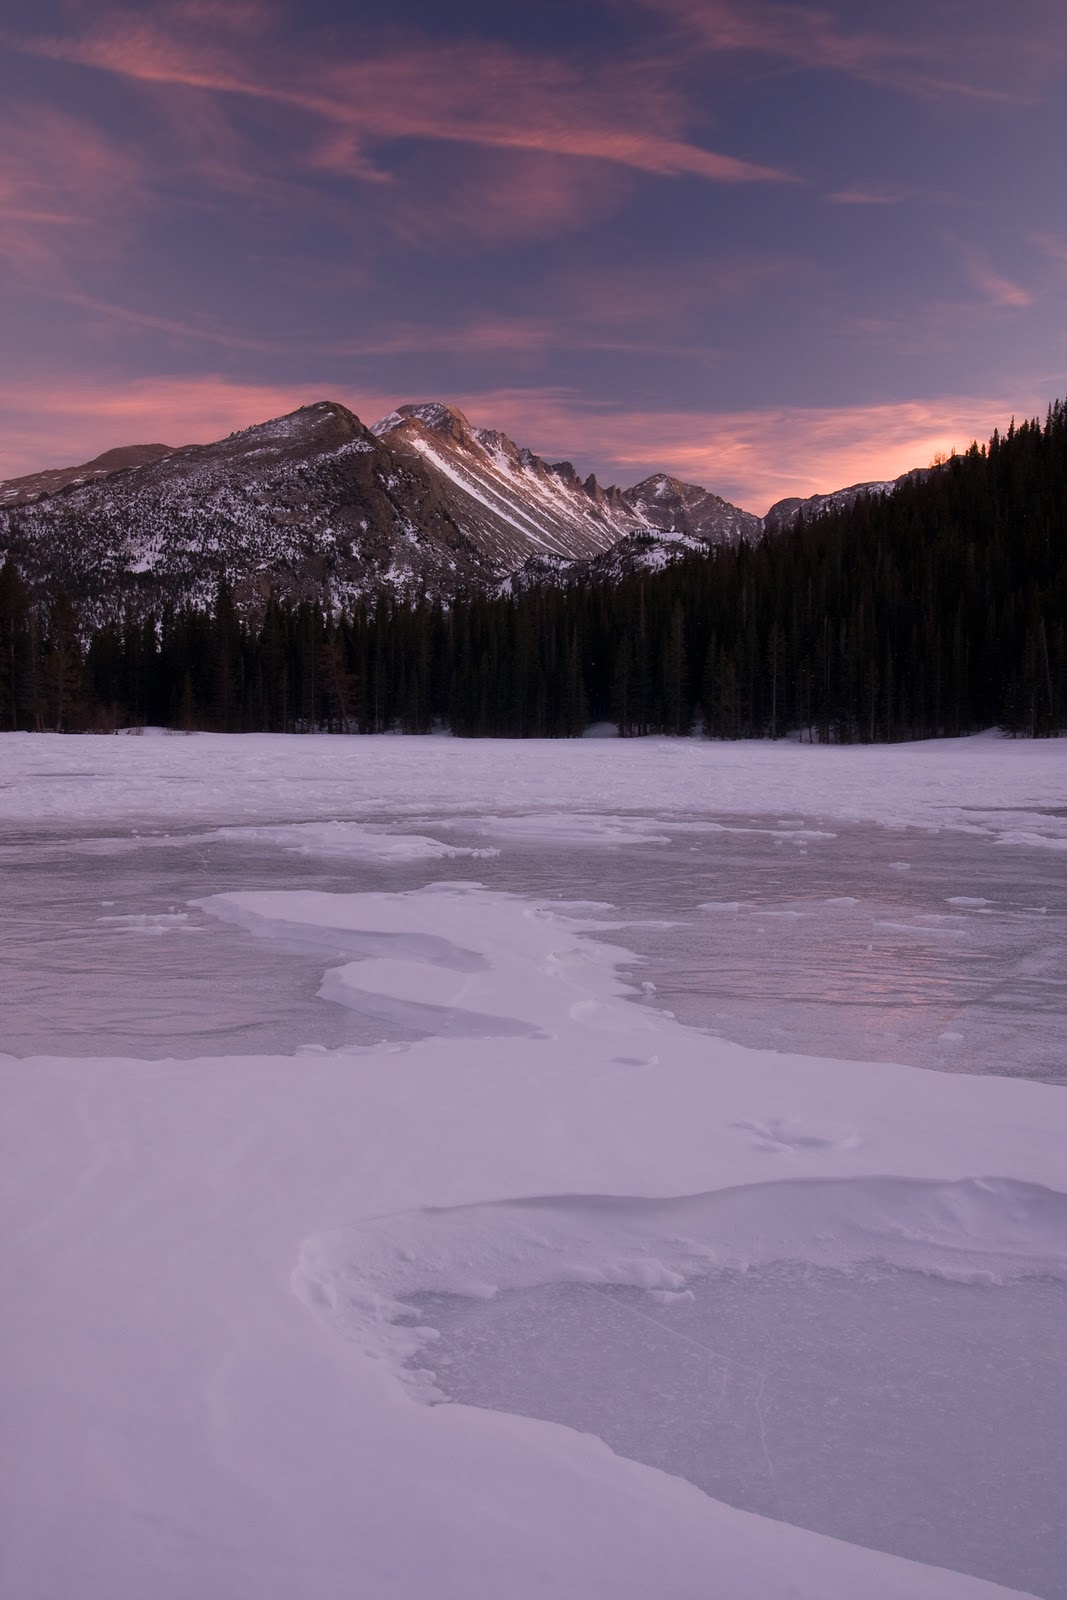 longs peak and frozen bear lake at sunset